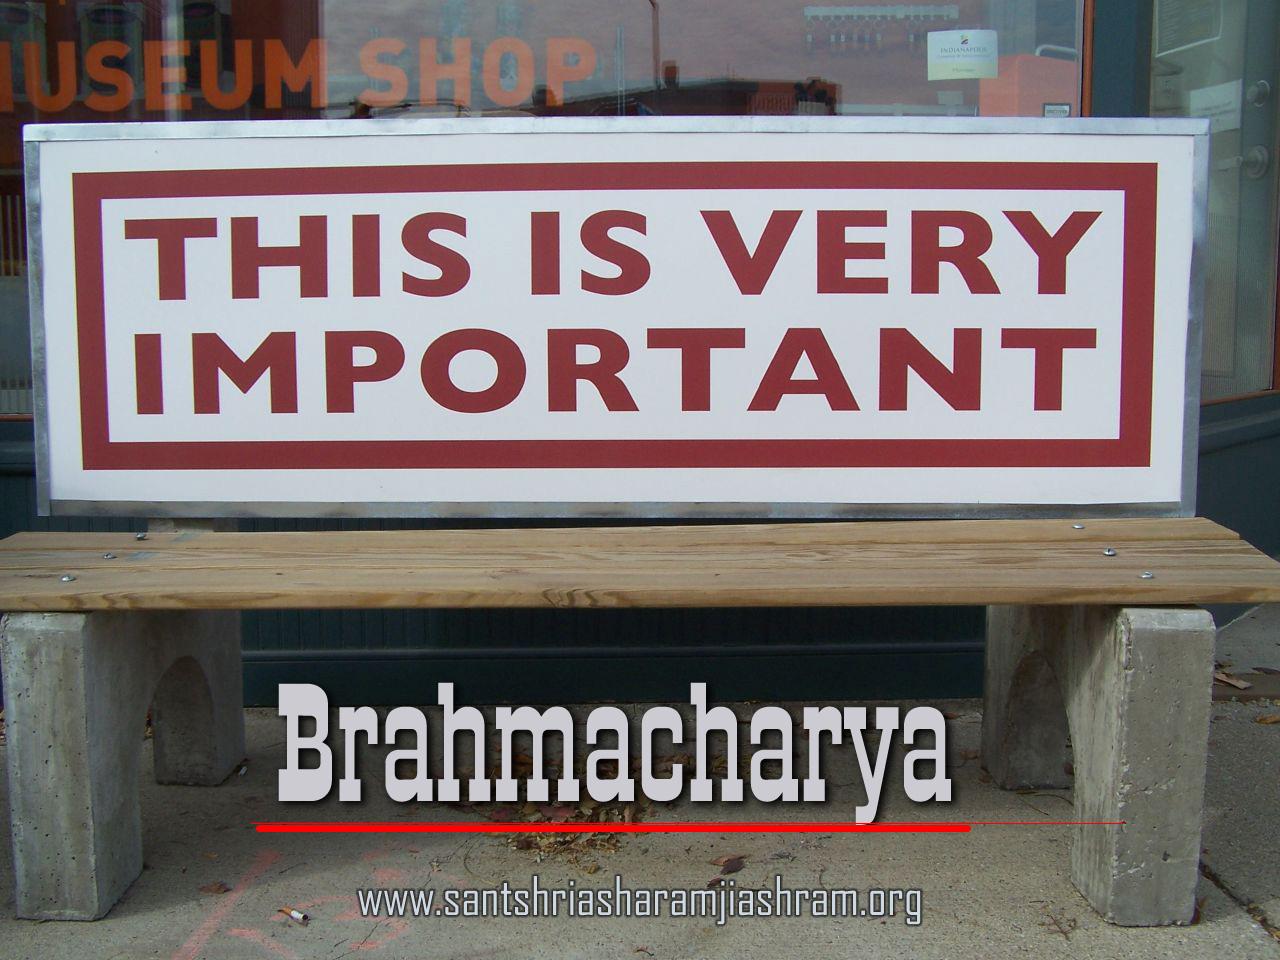 सफलता ,ब्रह्मचर्य,brahmacharya,success tip